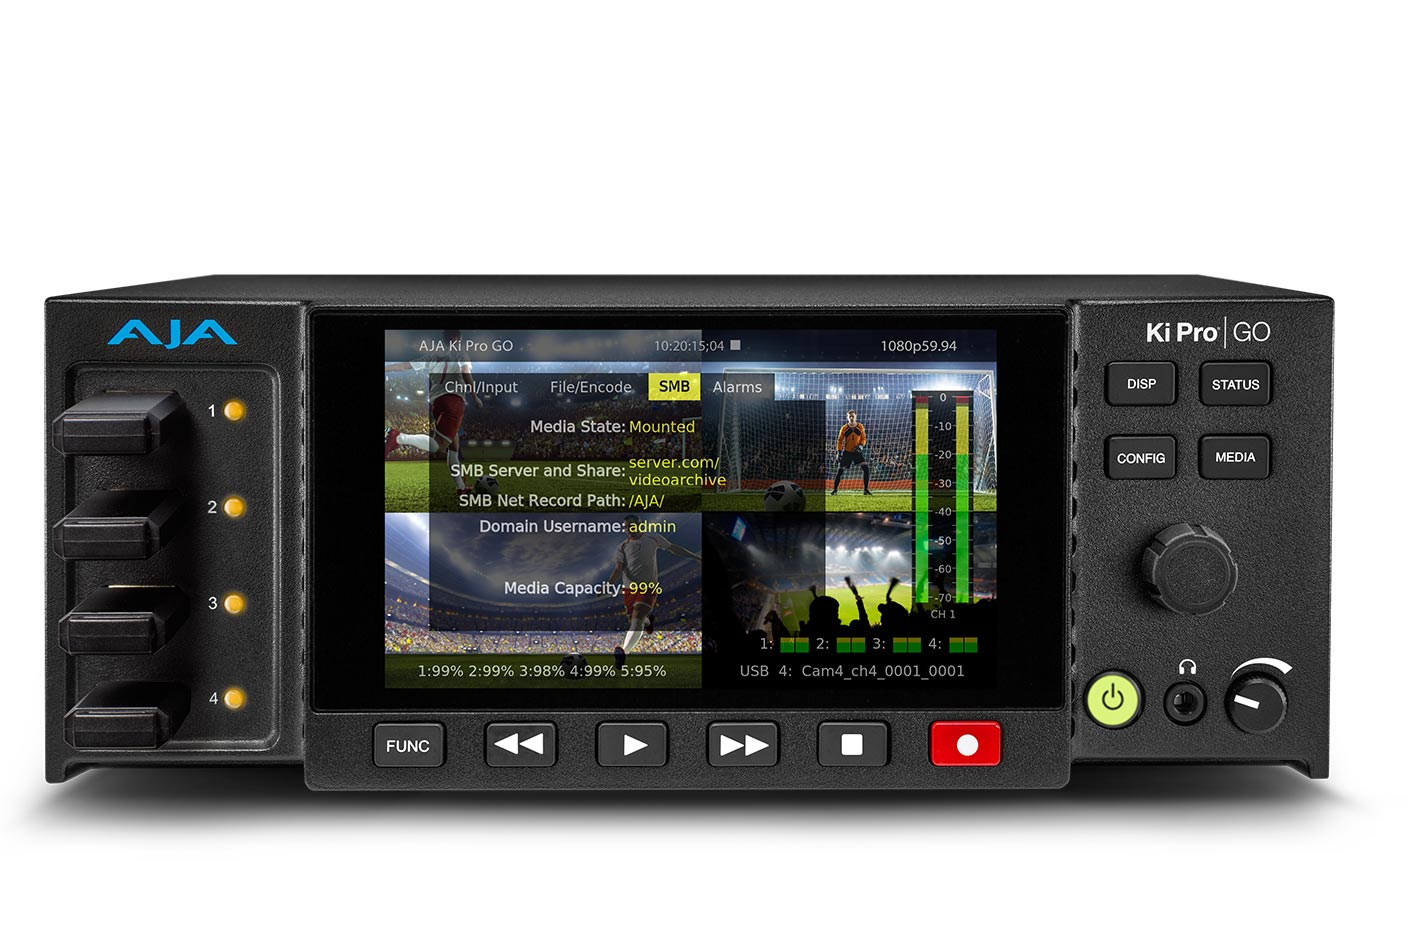 AJA Ki Pro GO v3.0 introduces expanded recording options